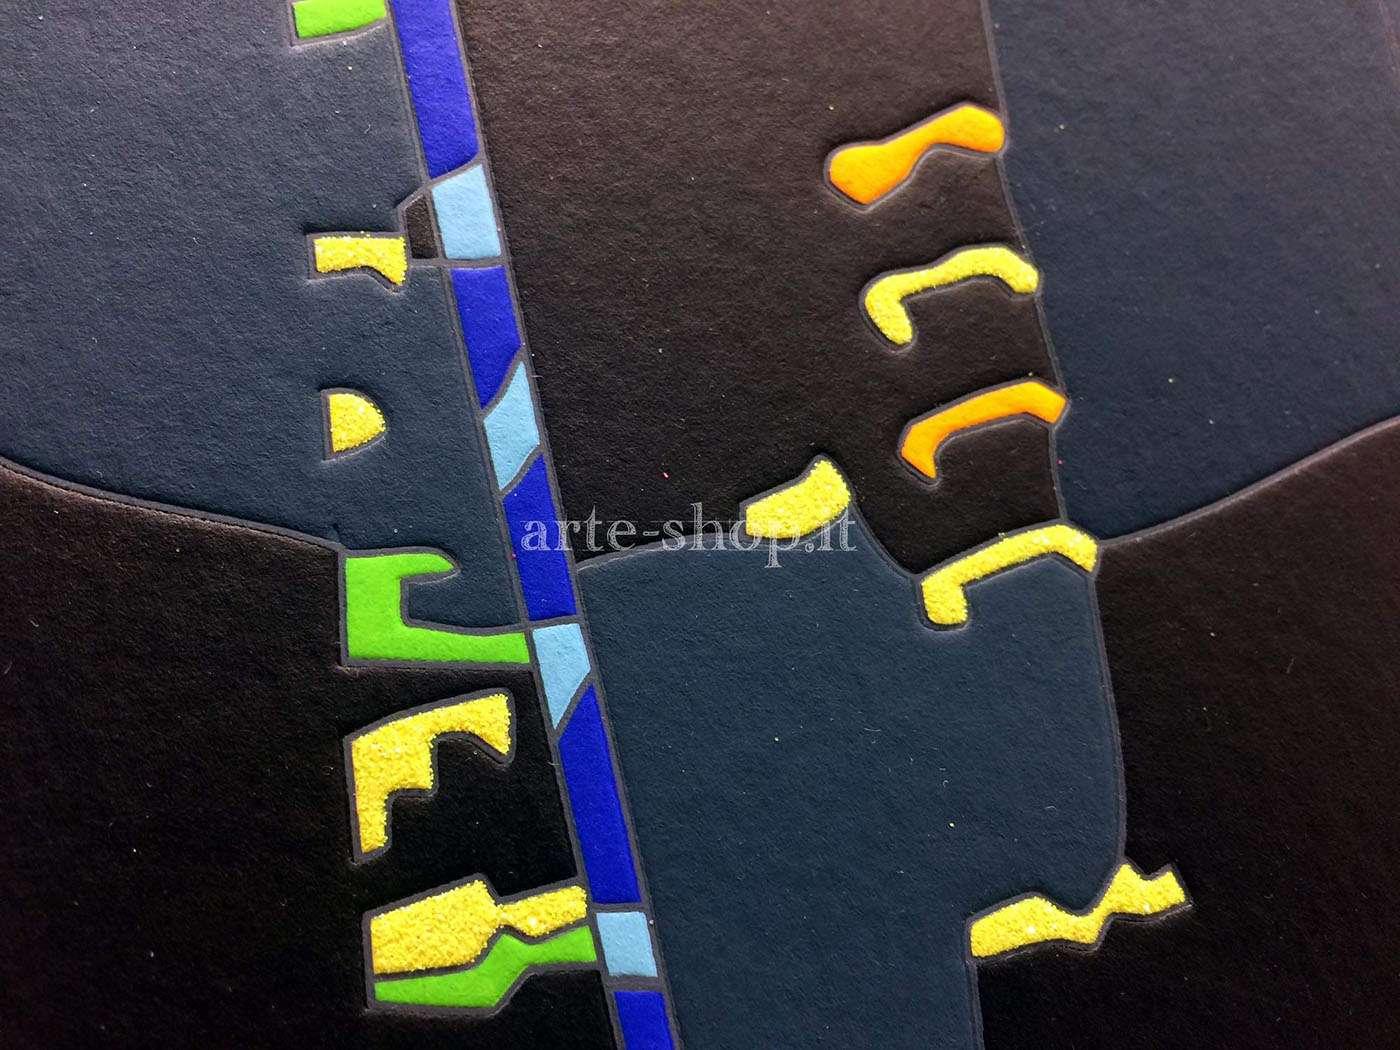 arte pentagono shop dettaglio numero 230